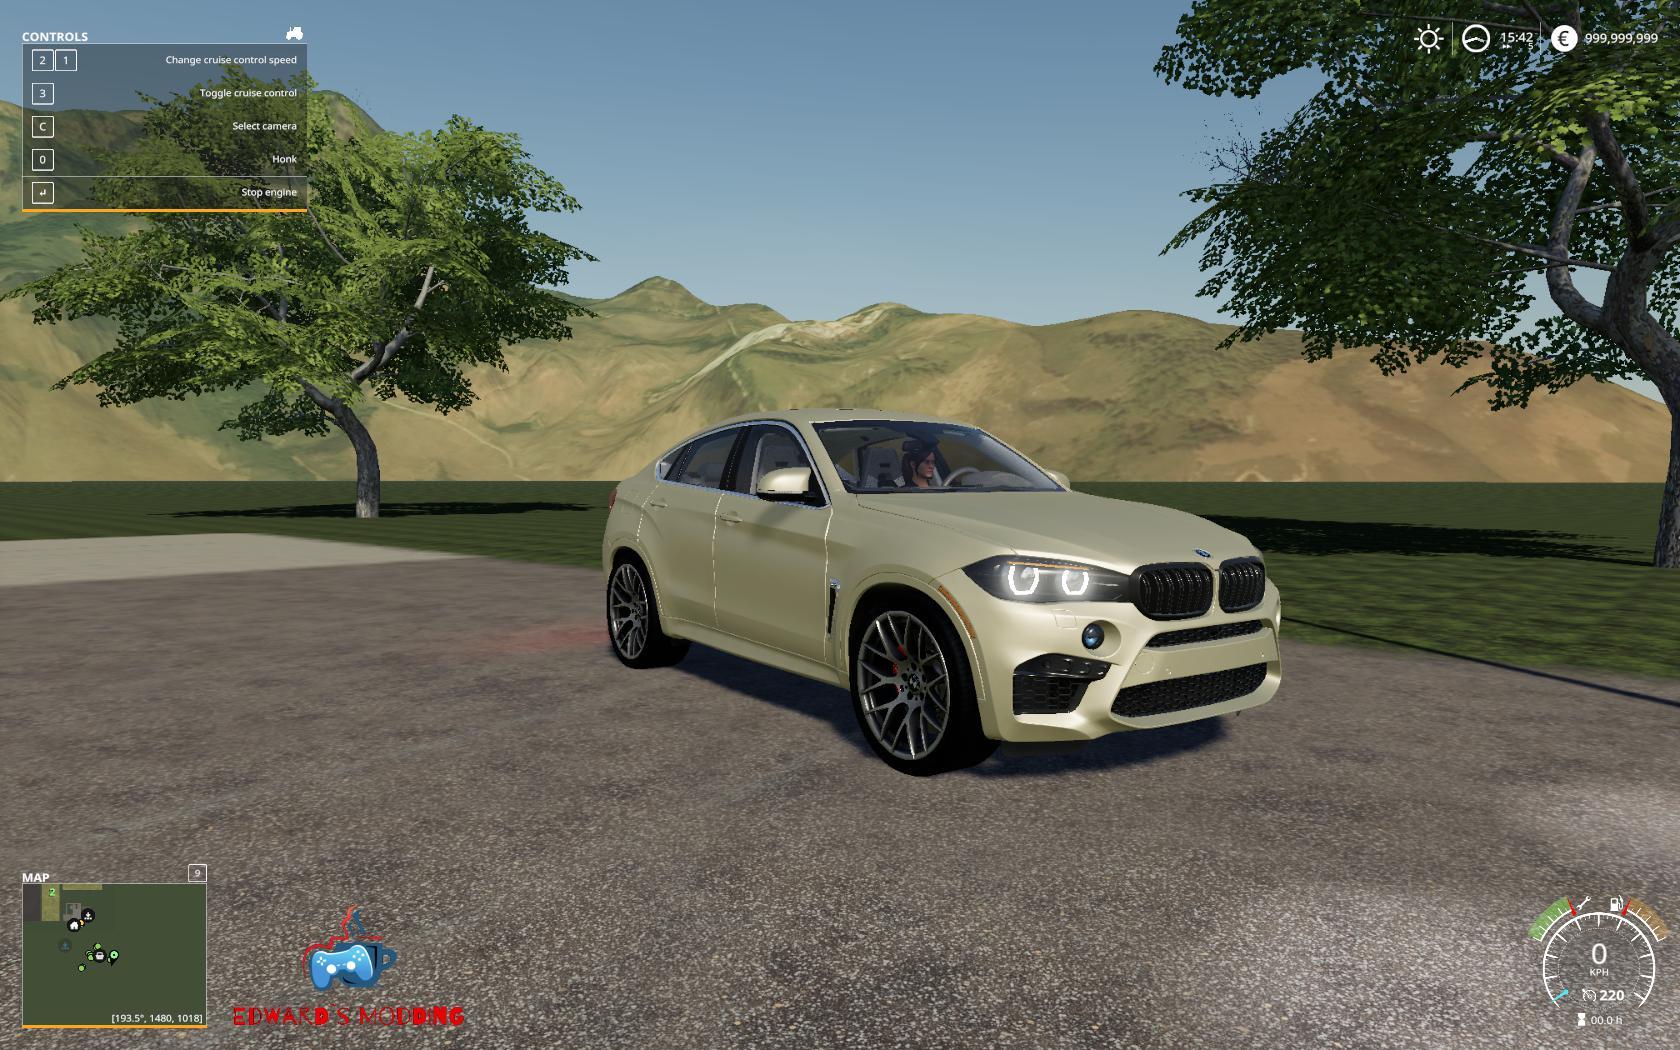 Bmw X6m 2016 v 1.0